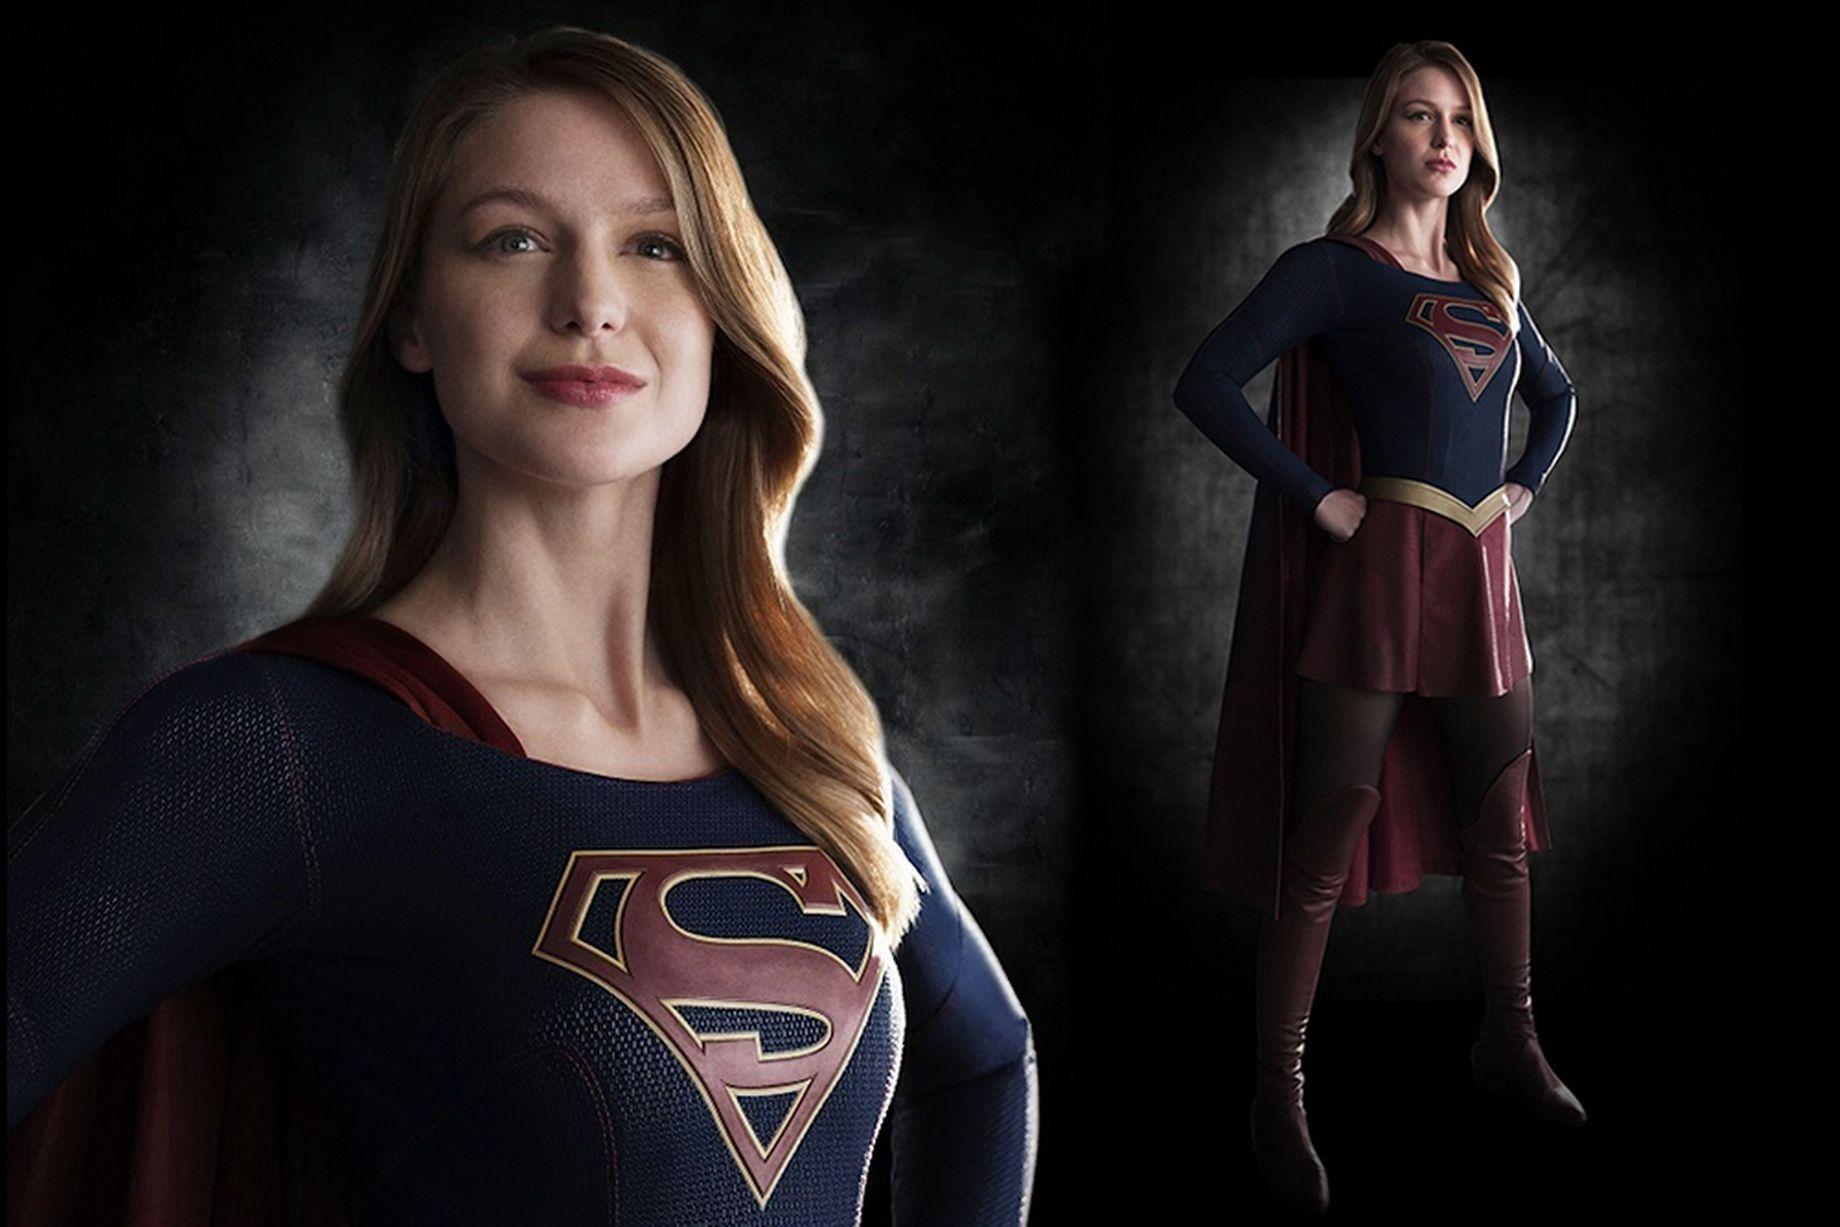 Melissa-Benoist-in-iconic-Supergirl-costume